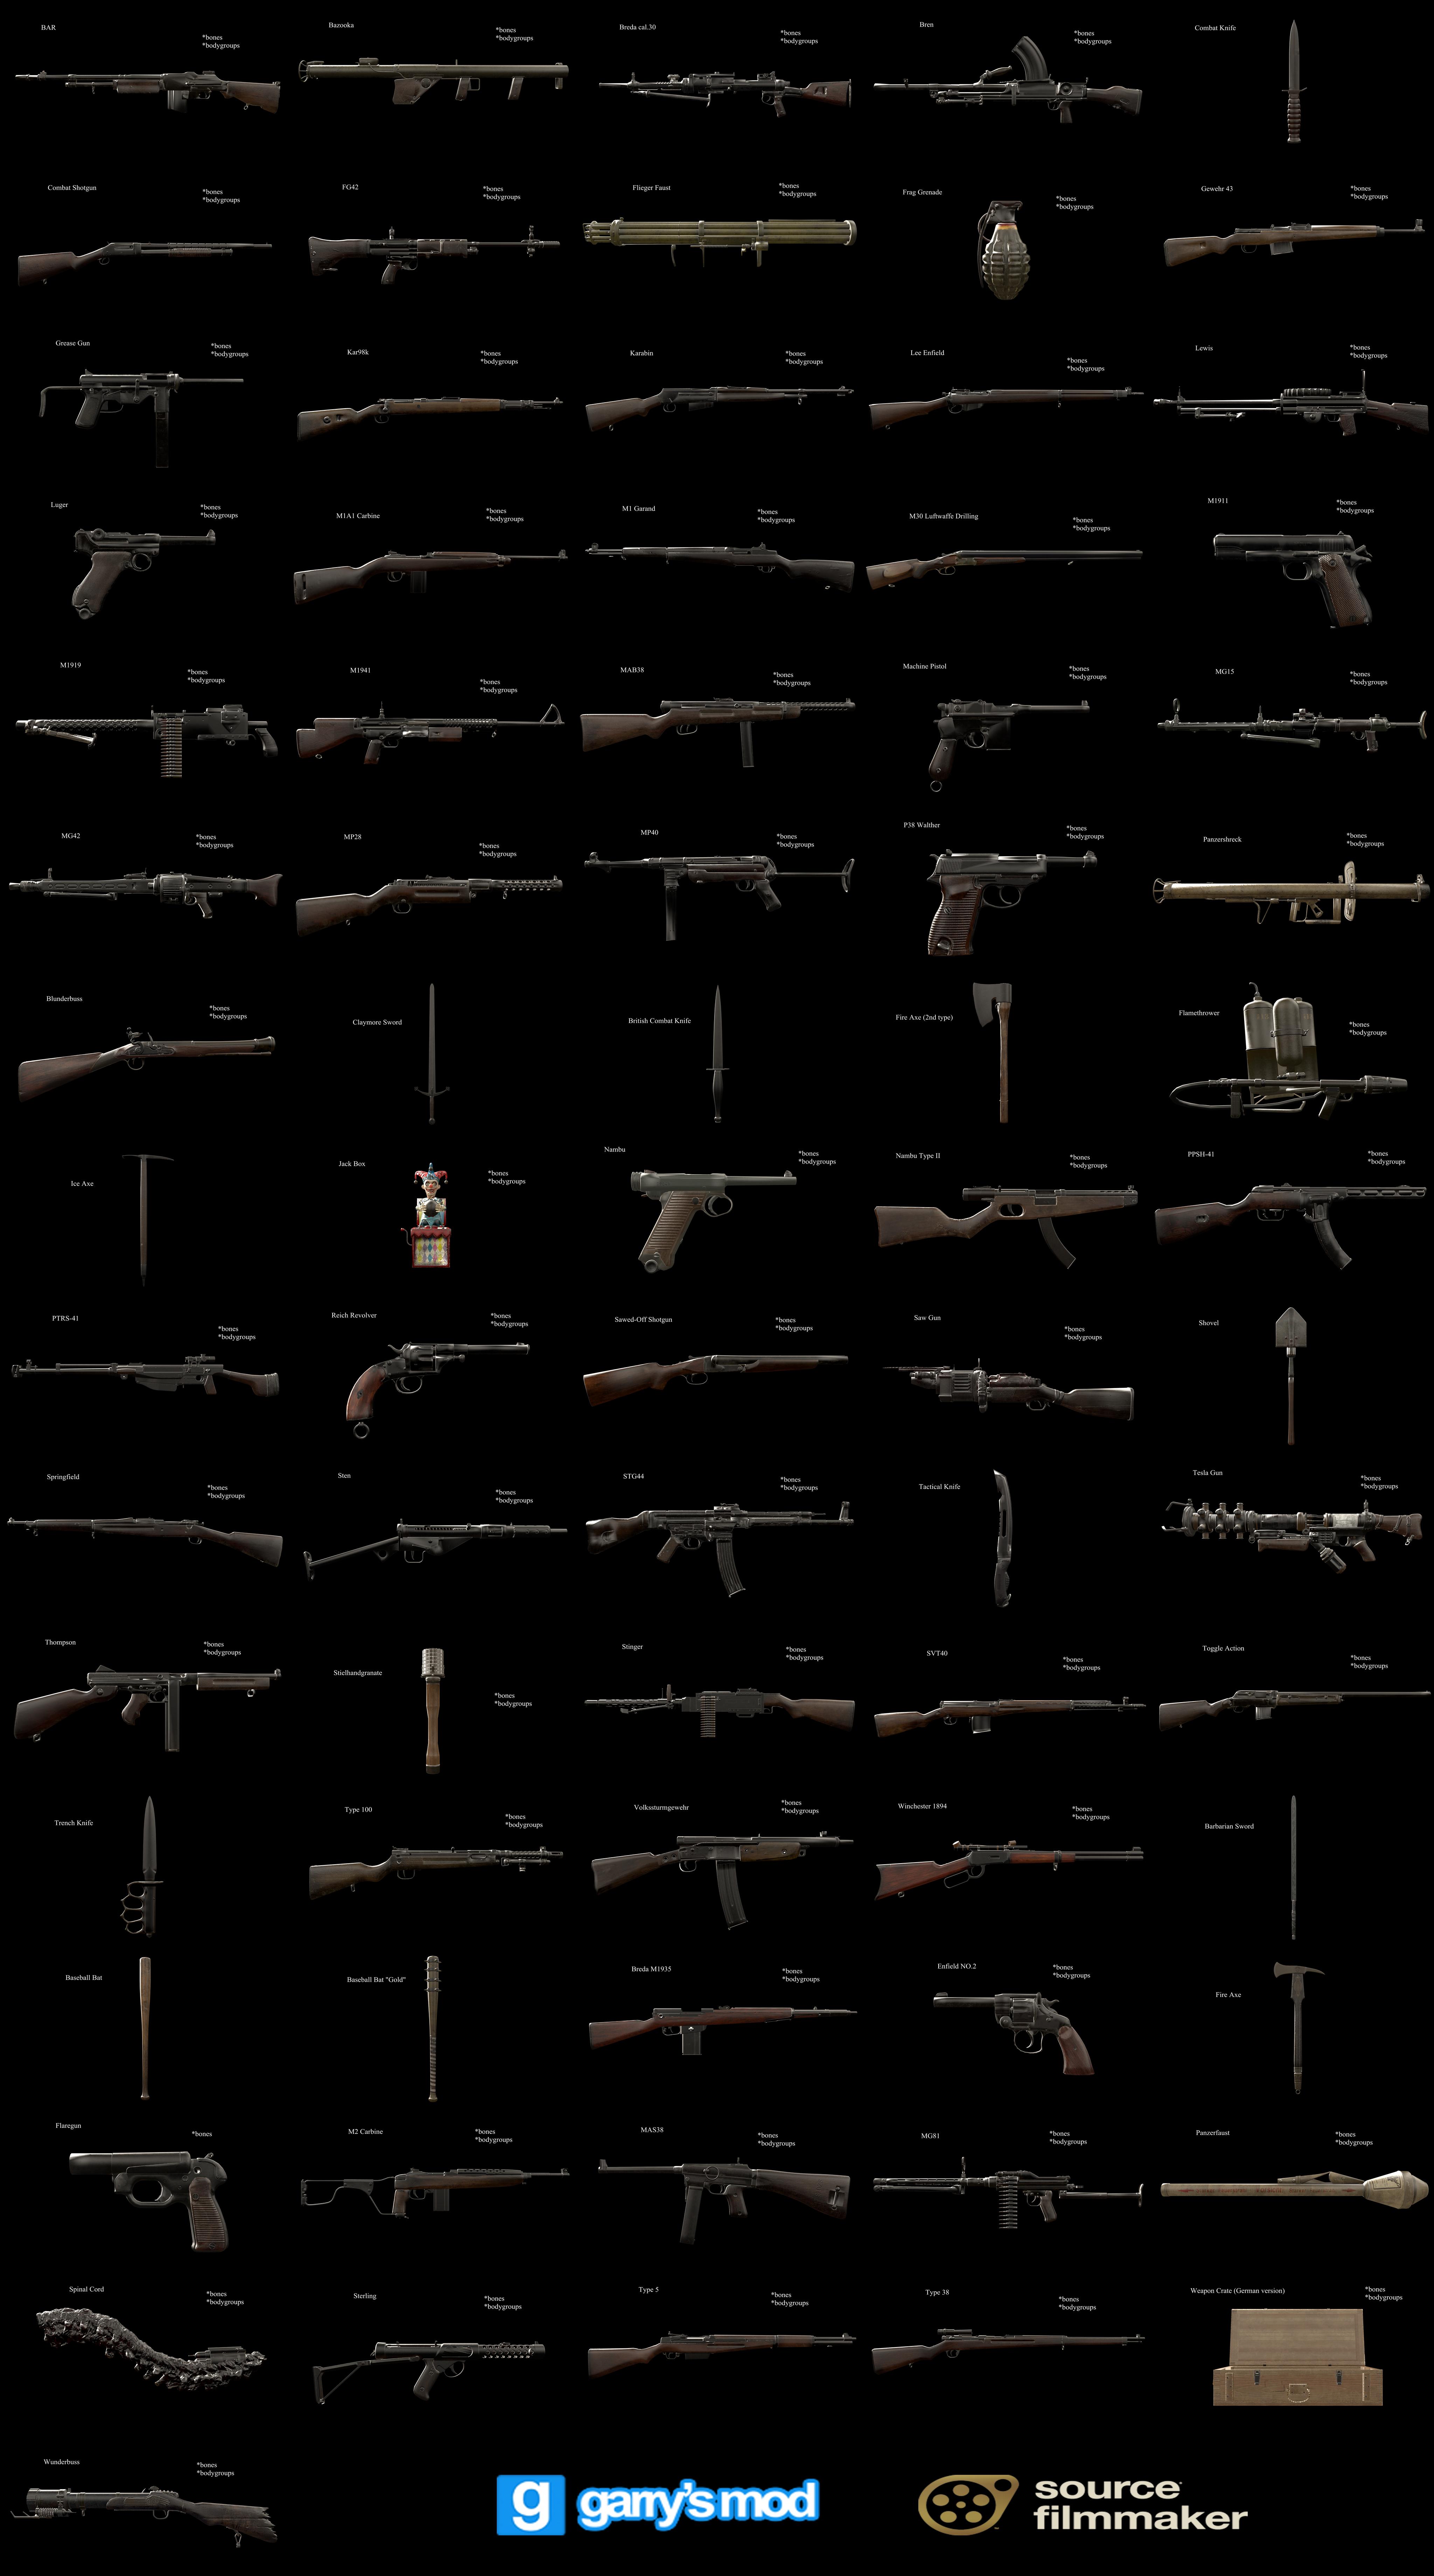 Dl Call Of Duty World War Ii Weapons Props By Stefano96 On Deviantart